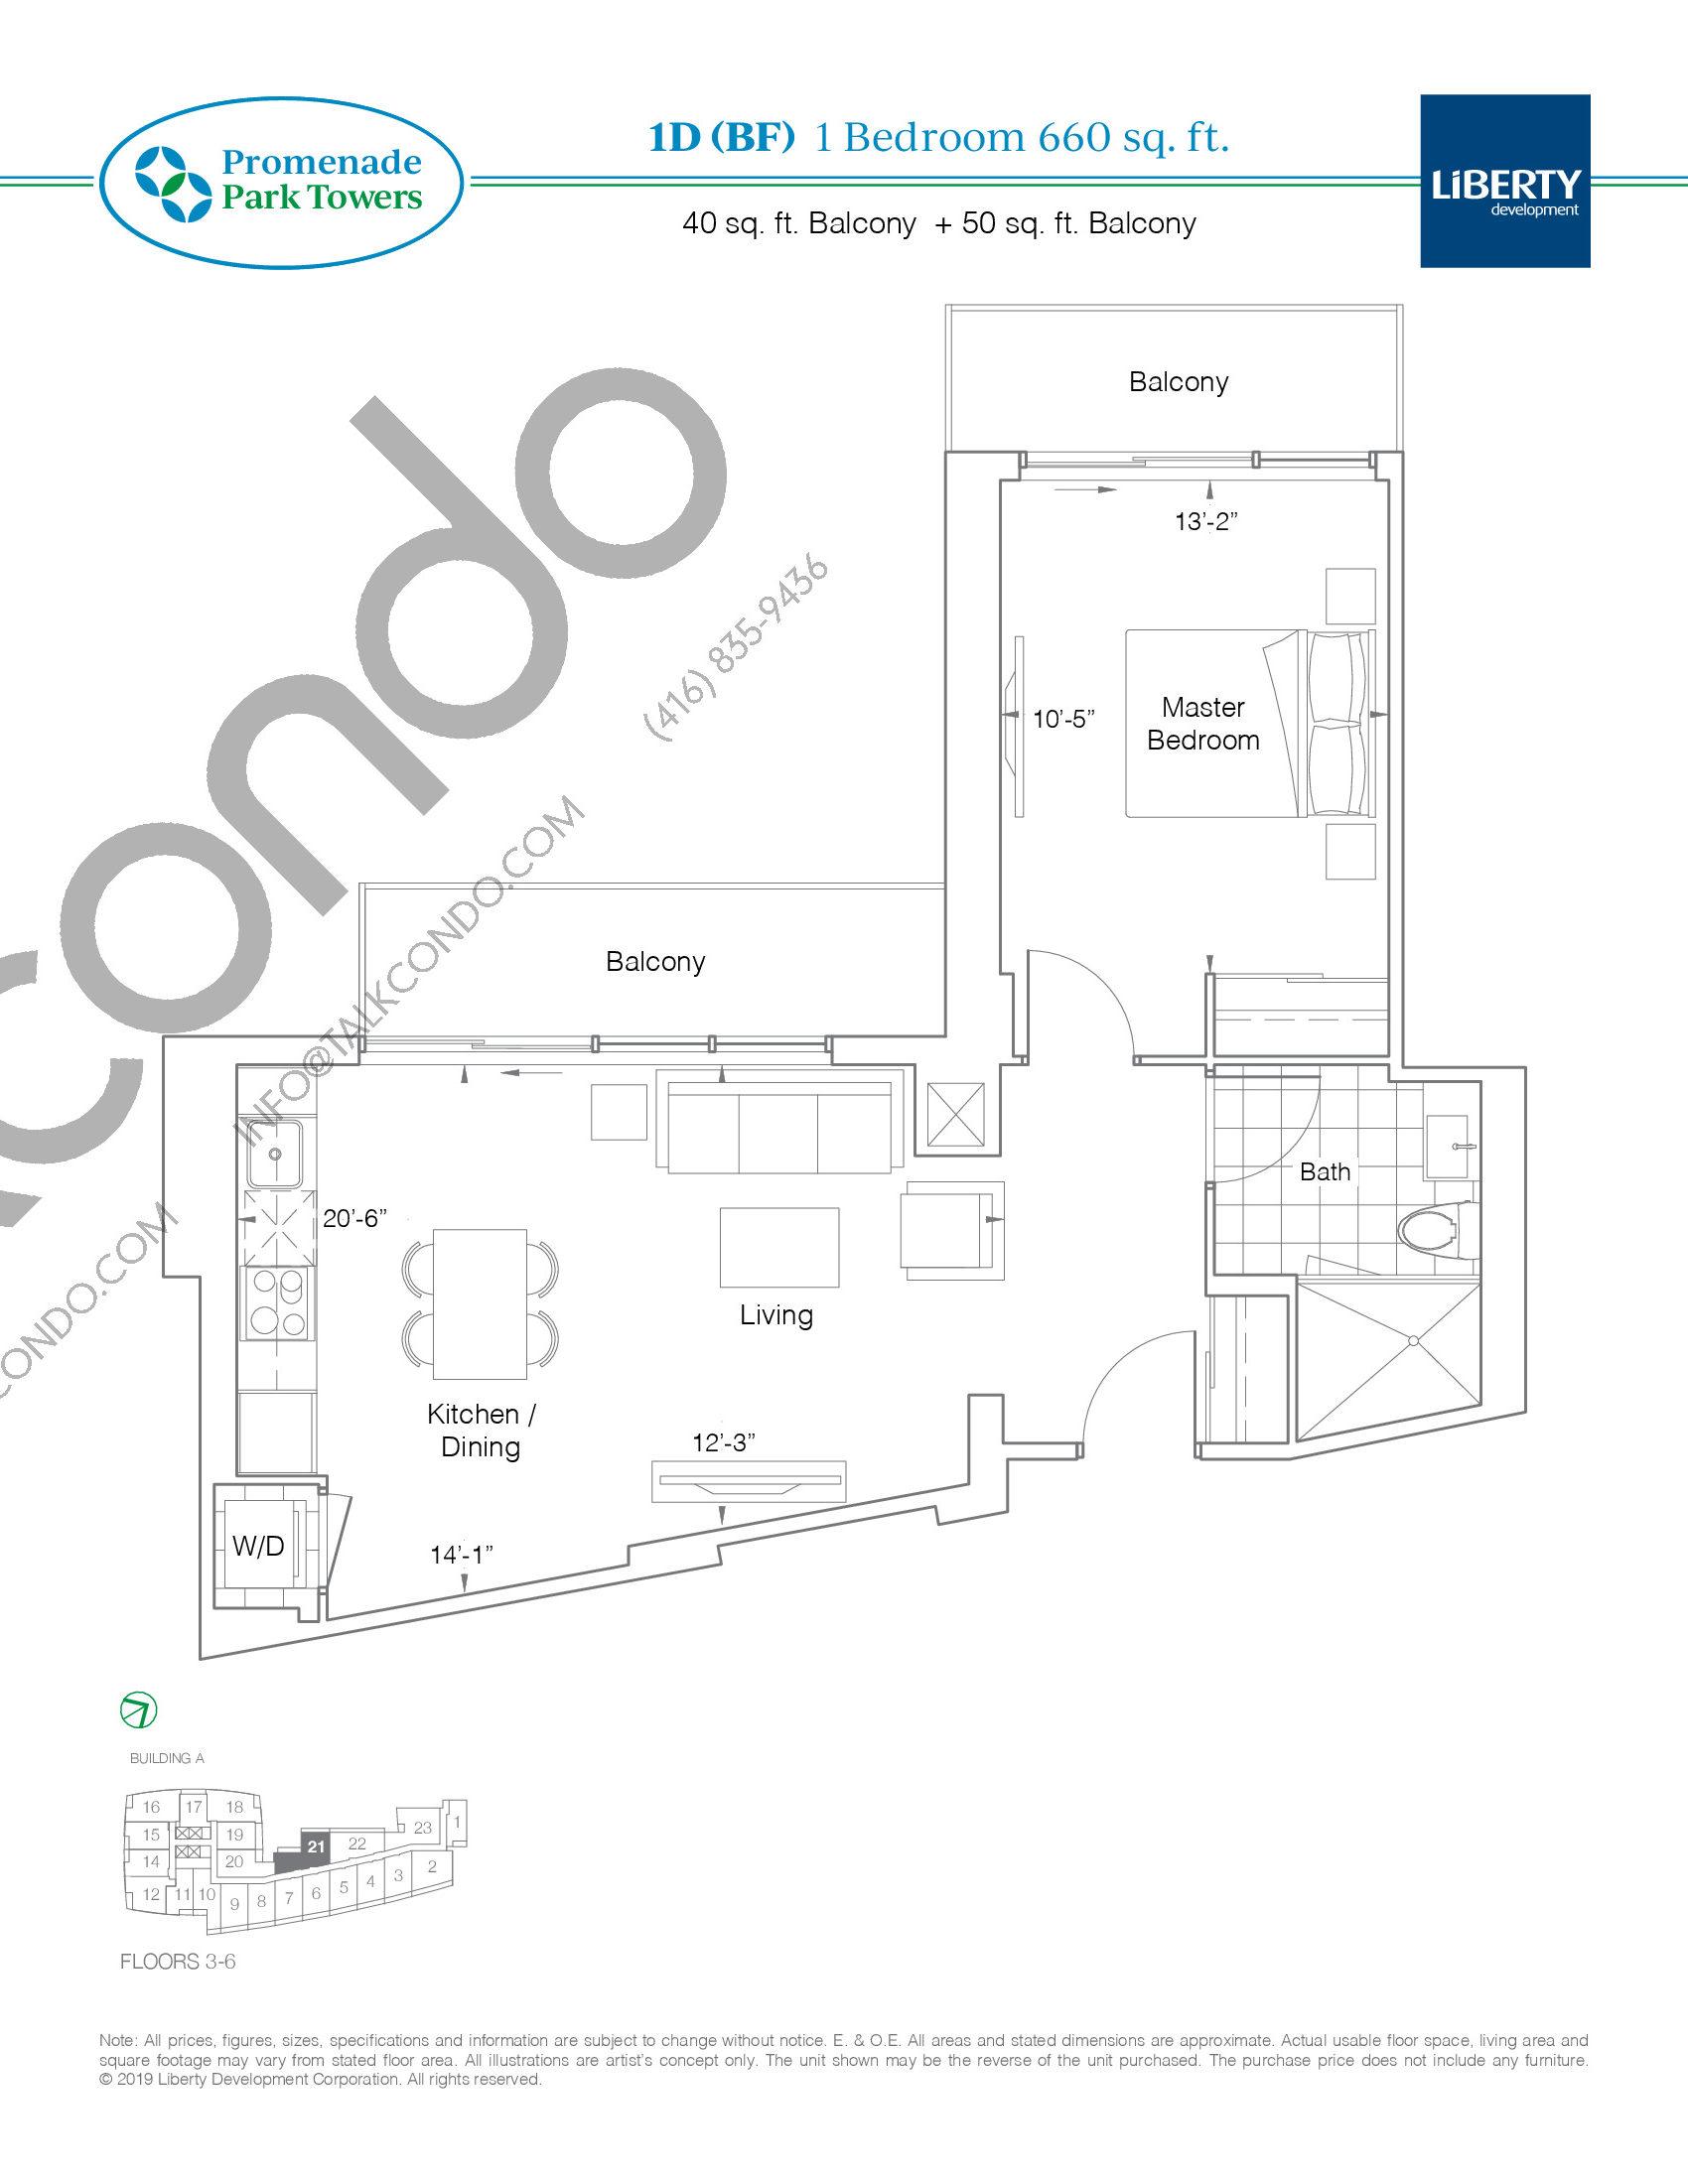 1D (BF) Floor Plan at Promenade Park Towers Condos - 660 sq.ft